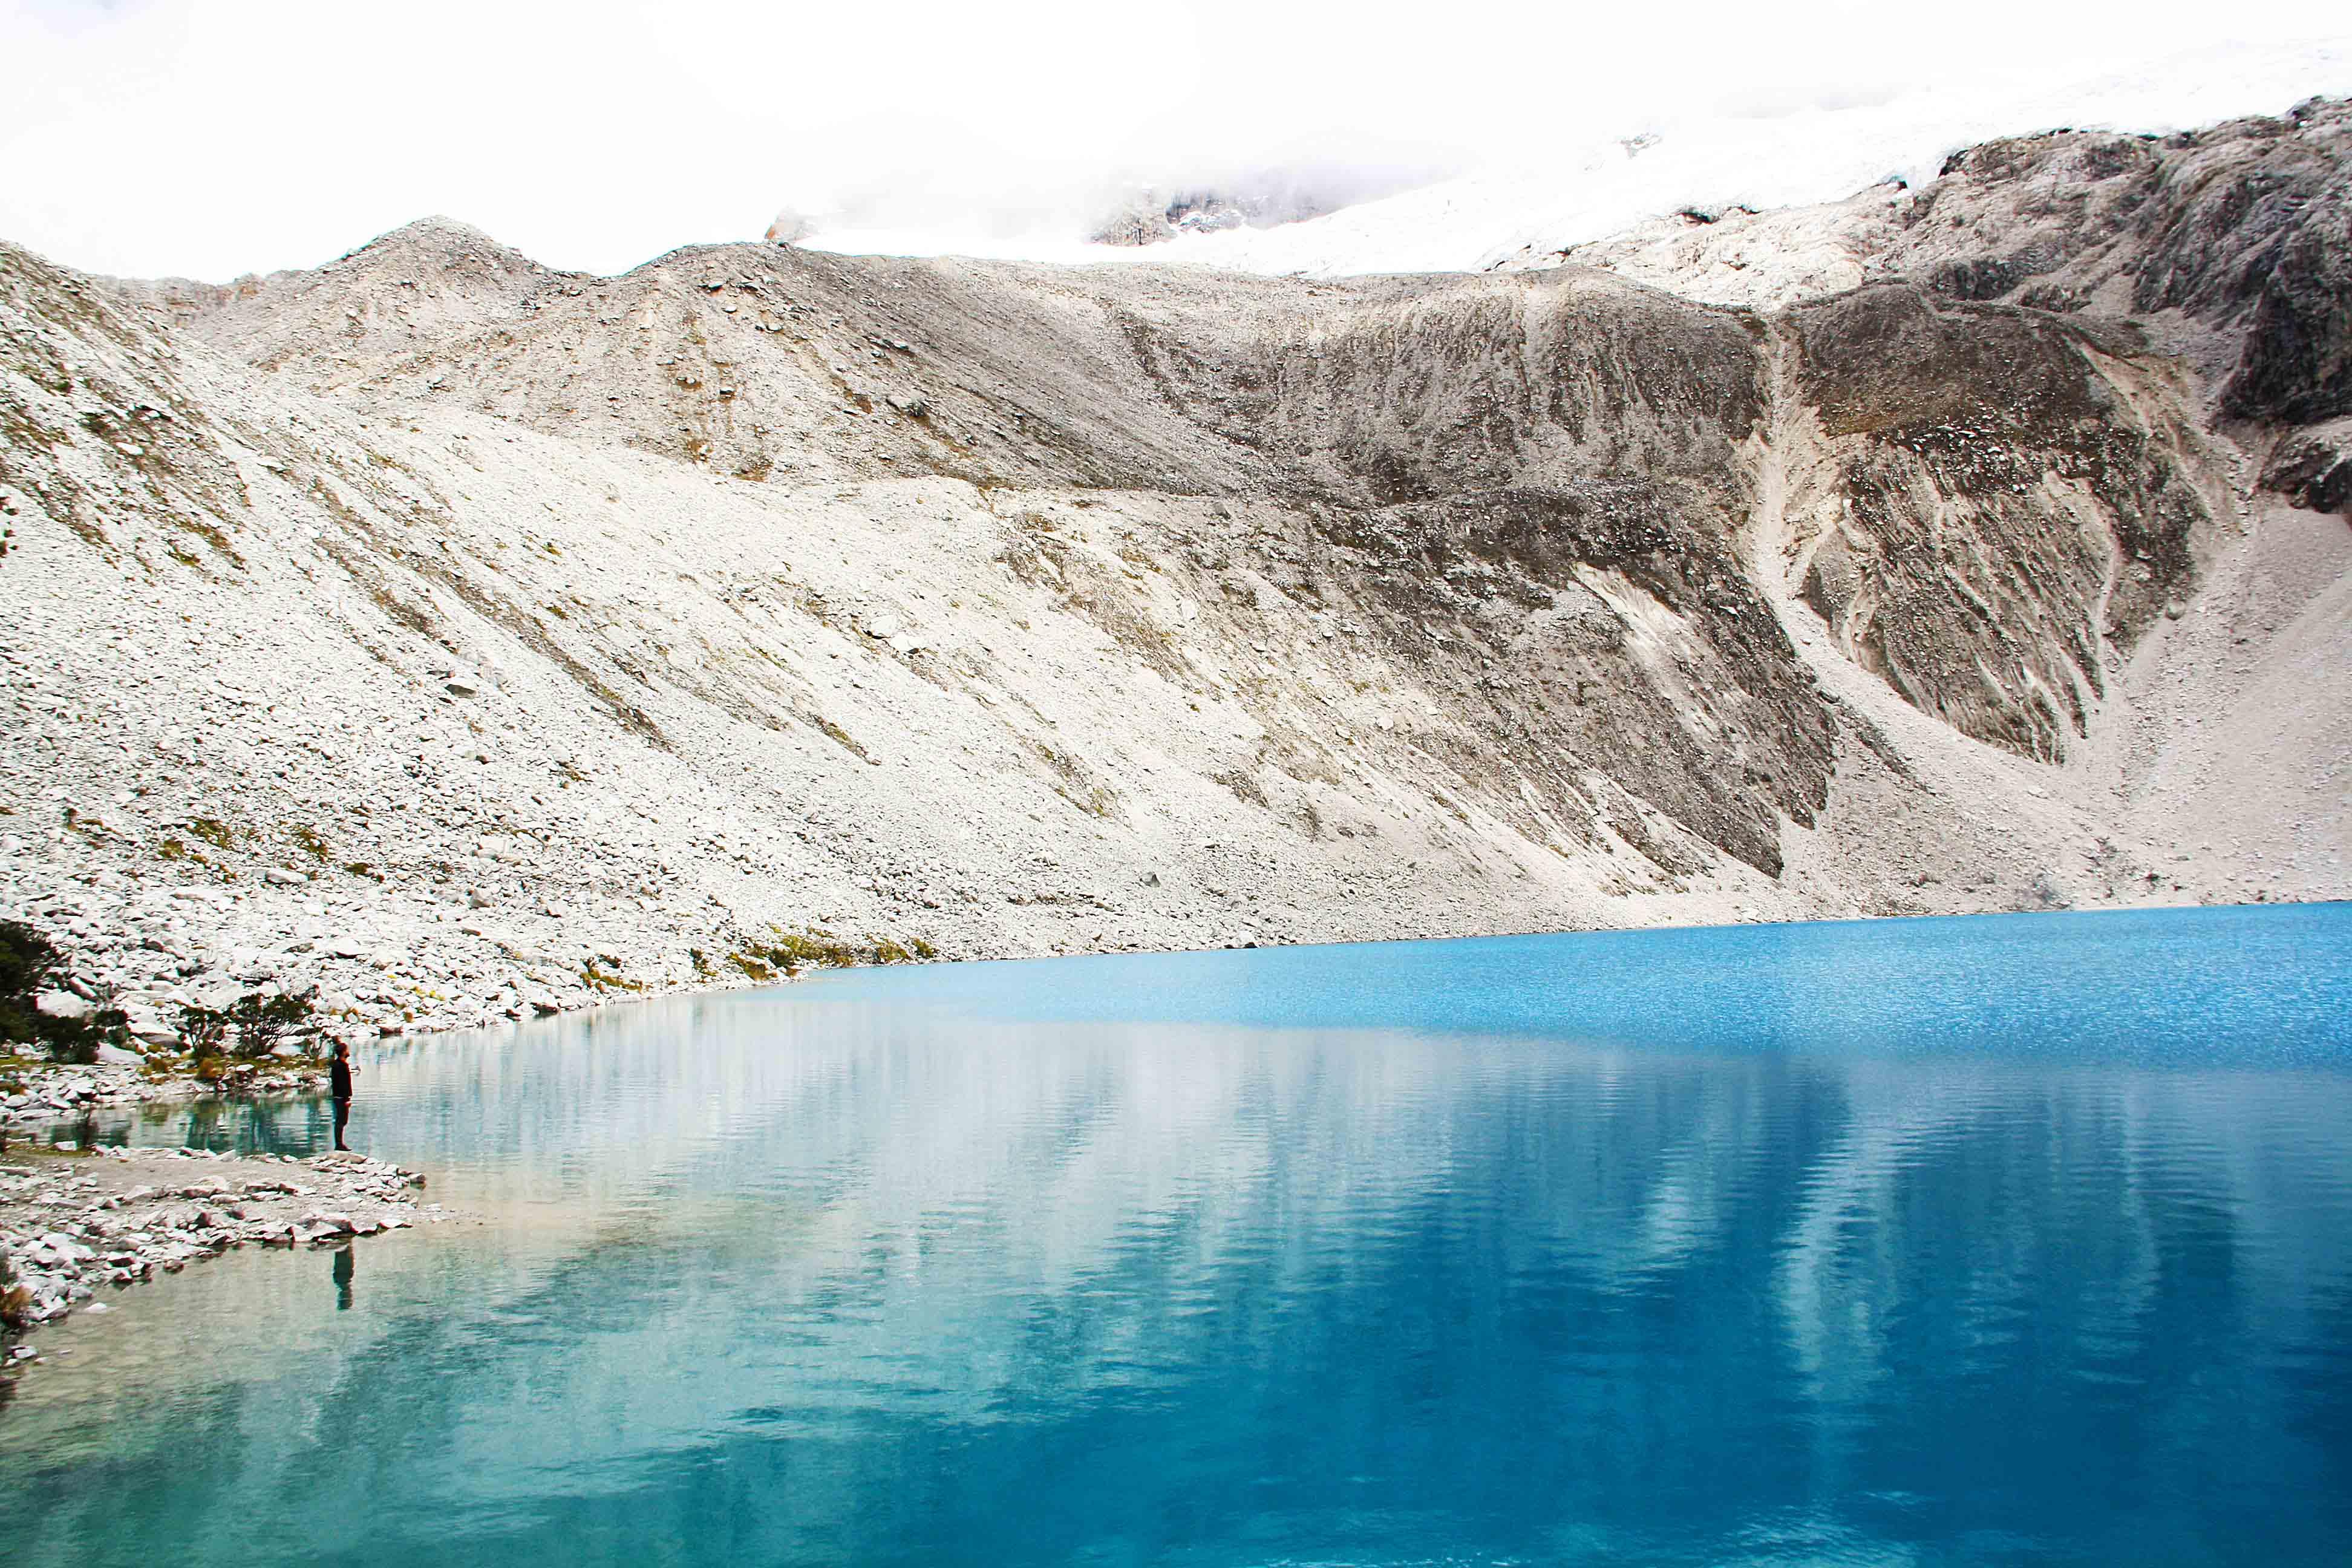 laguna 69 glacier lake peru